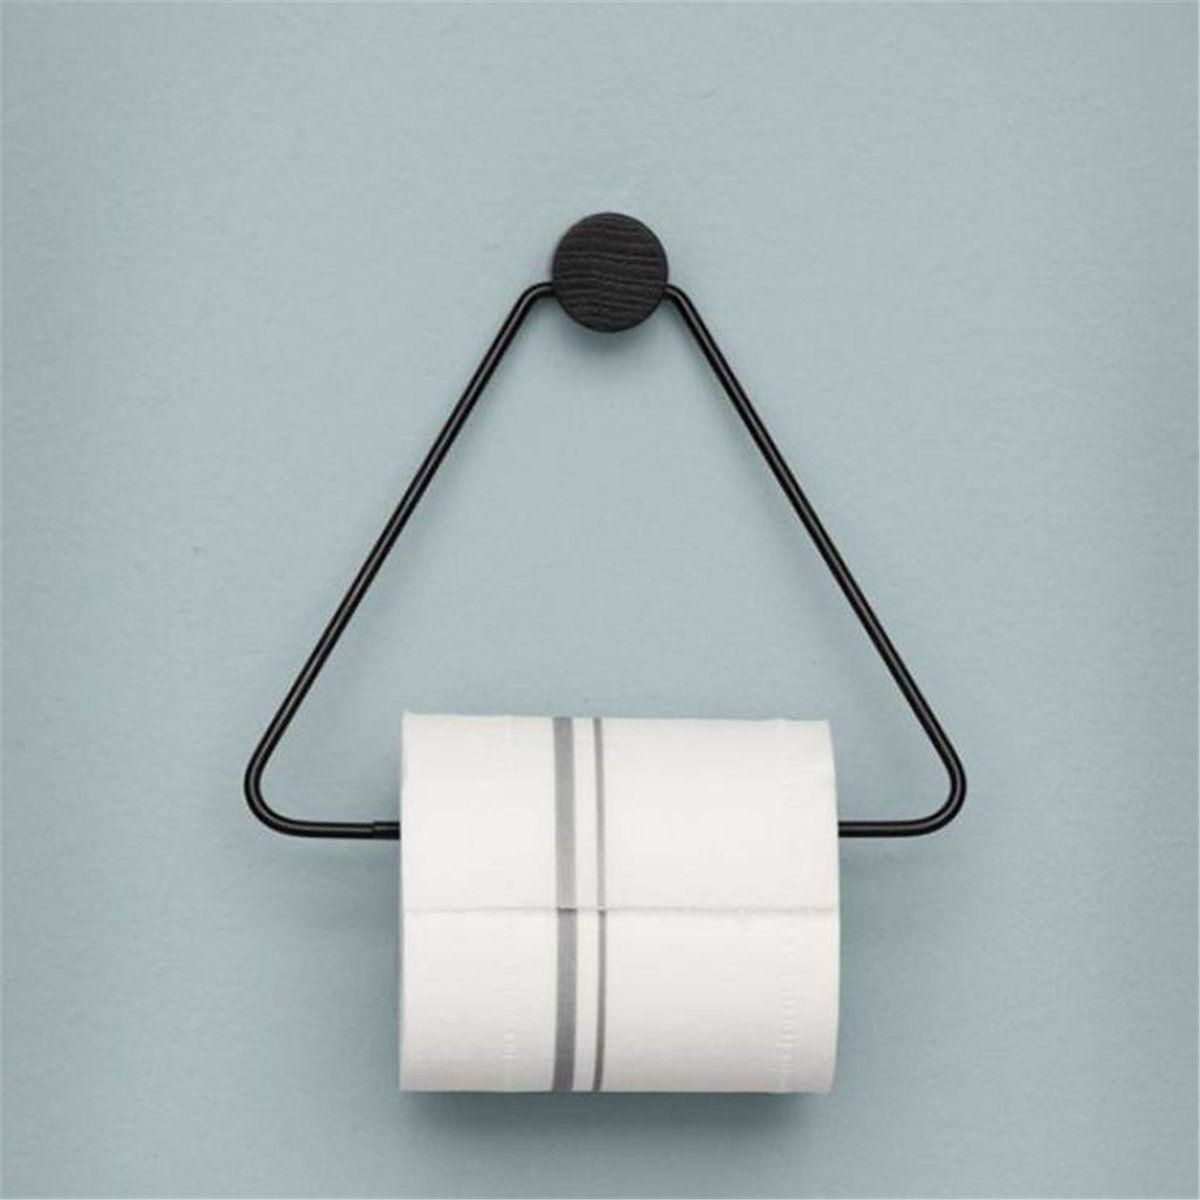 Vintage Toilet Paper Towel Roll Holder Bathroom Wall Mounted Rack Storage Shelf